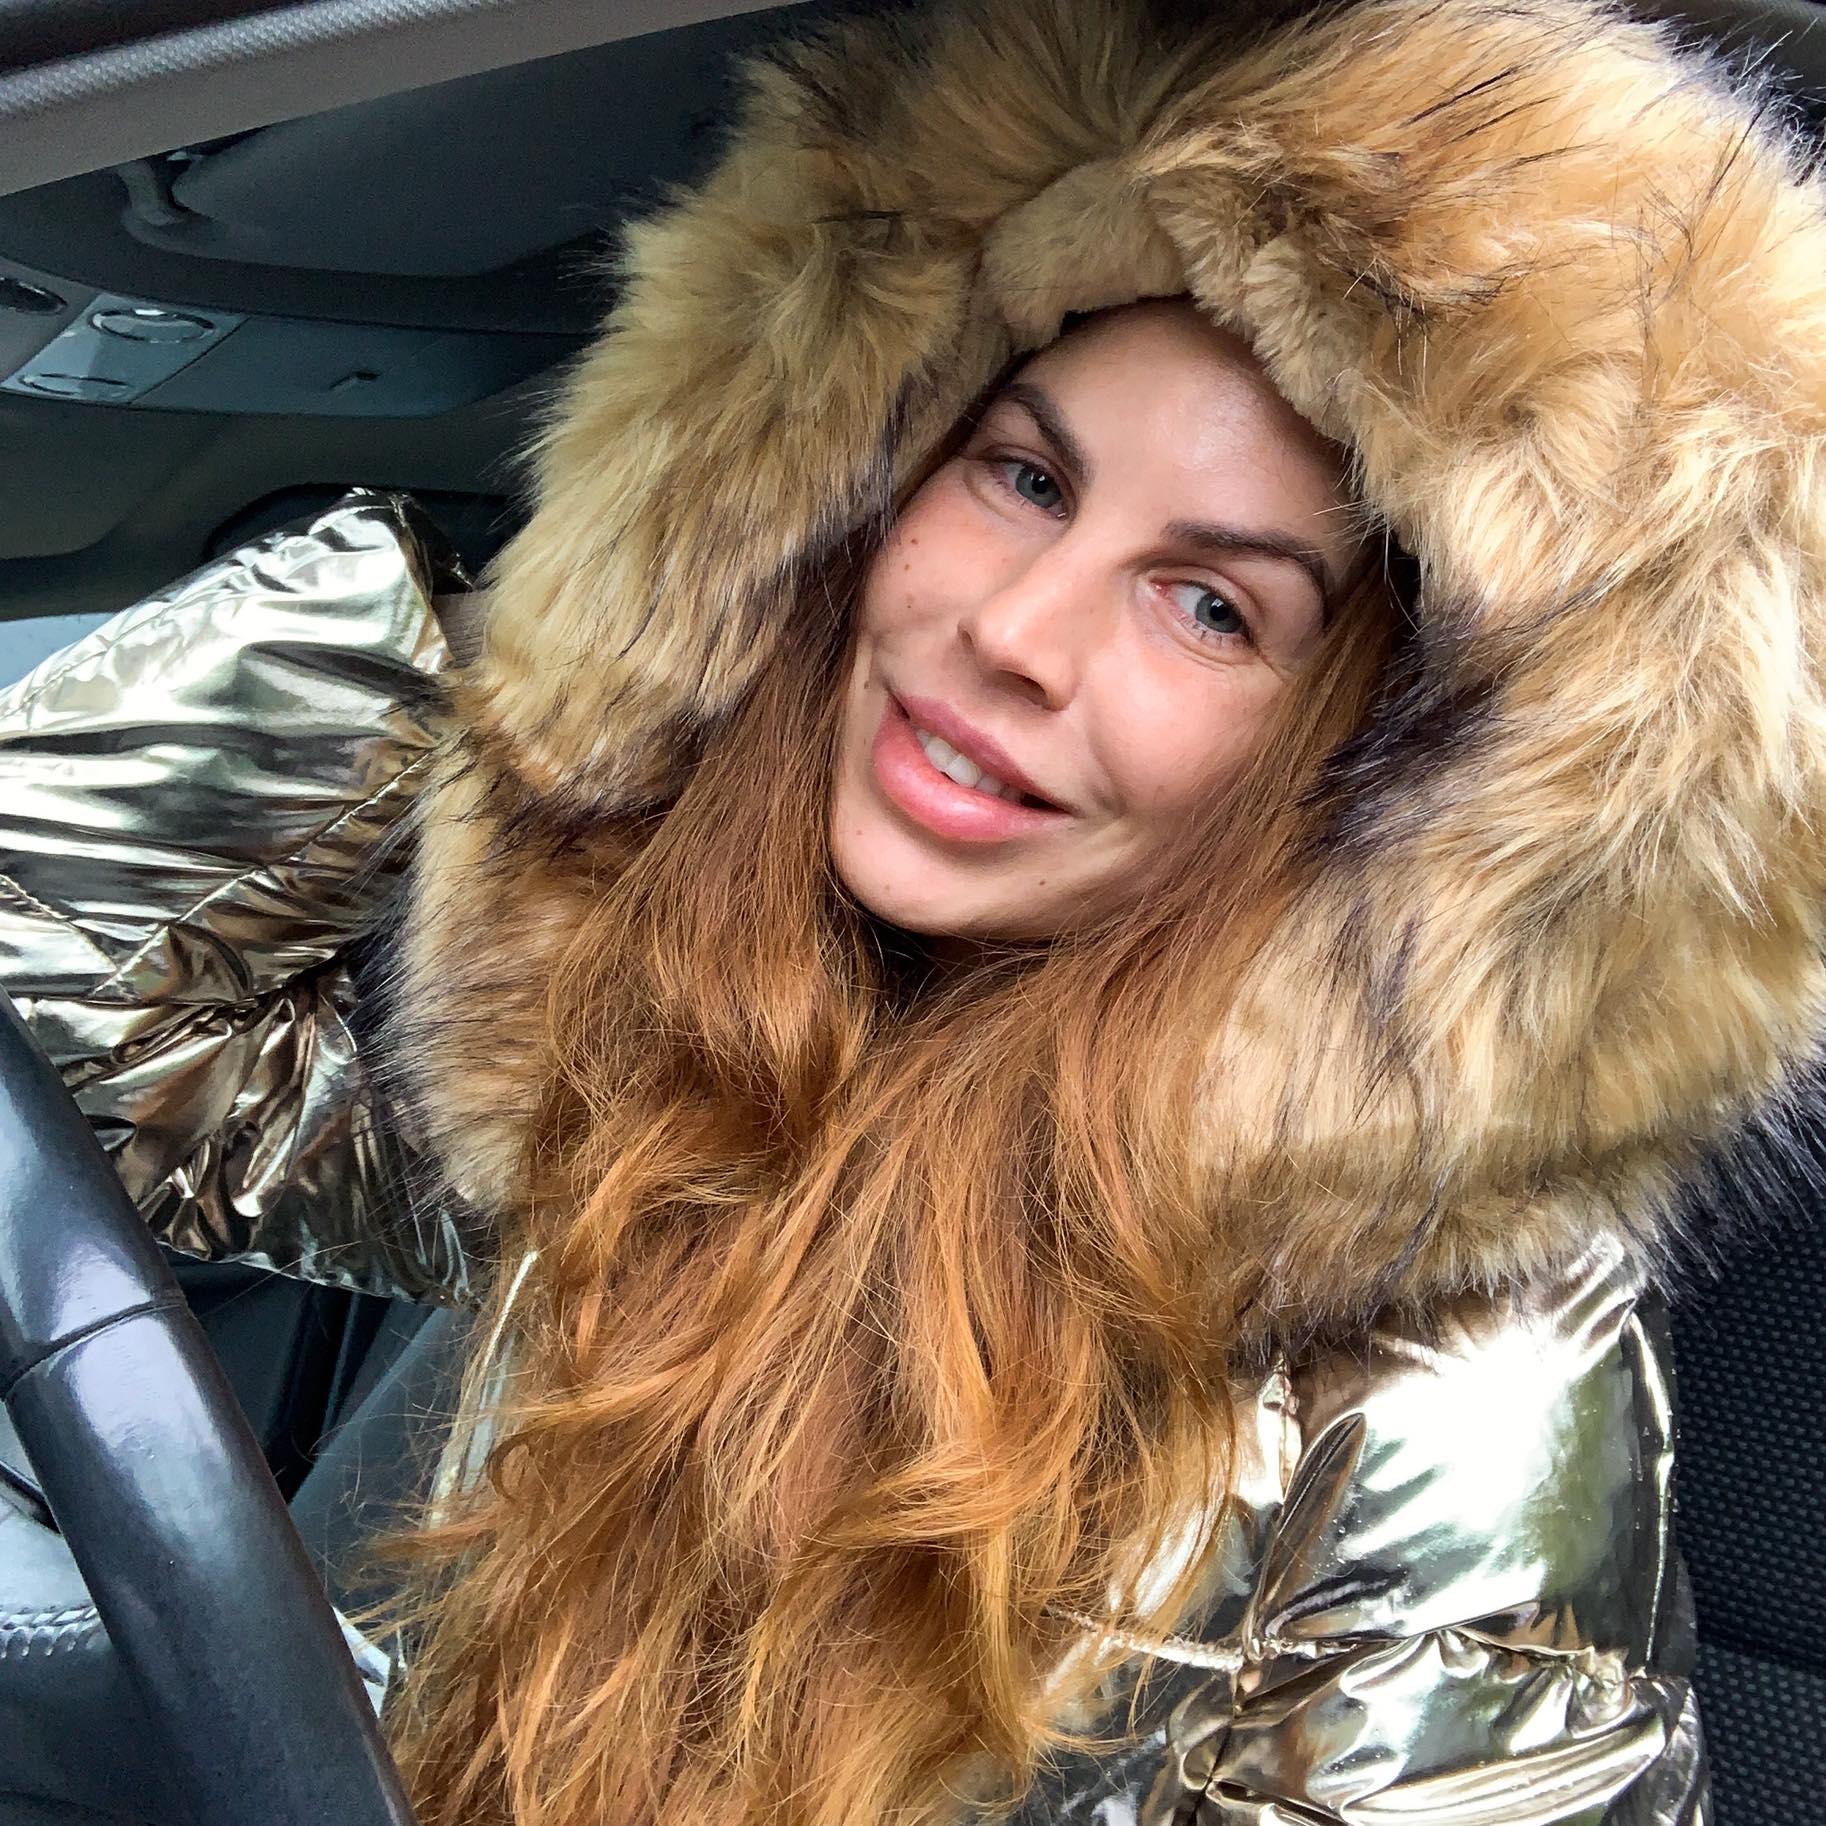 Veronika Brezinová